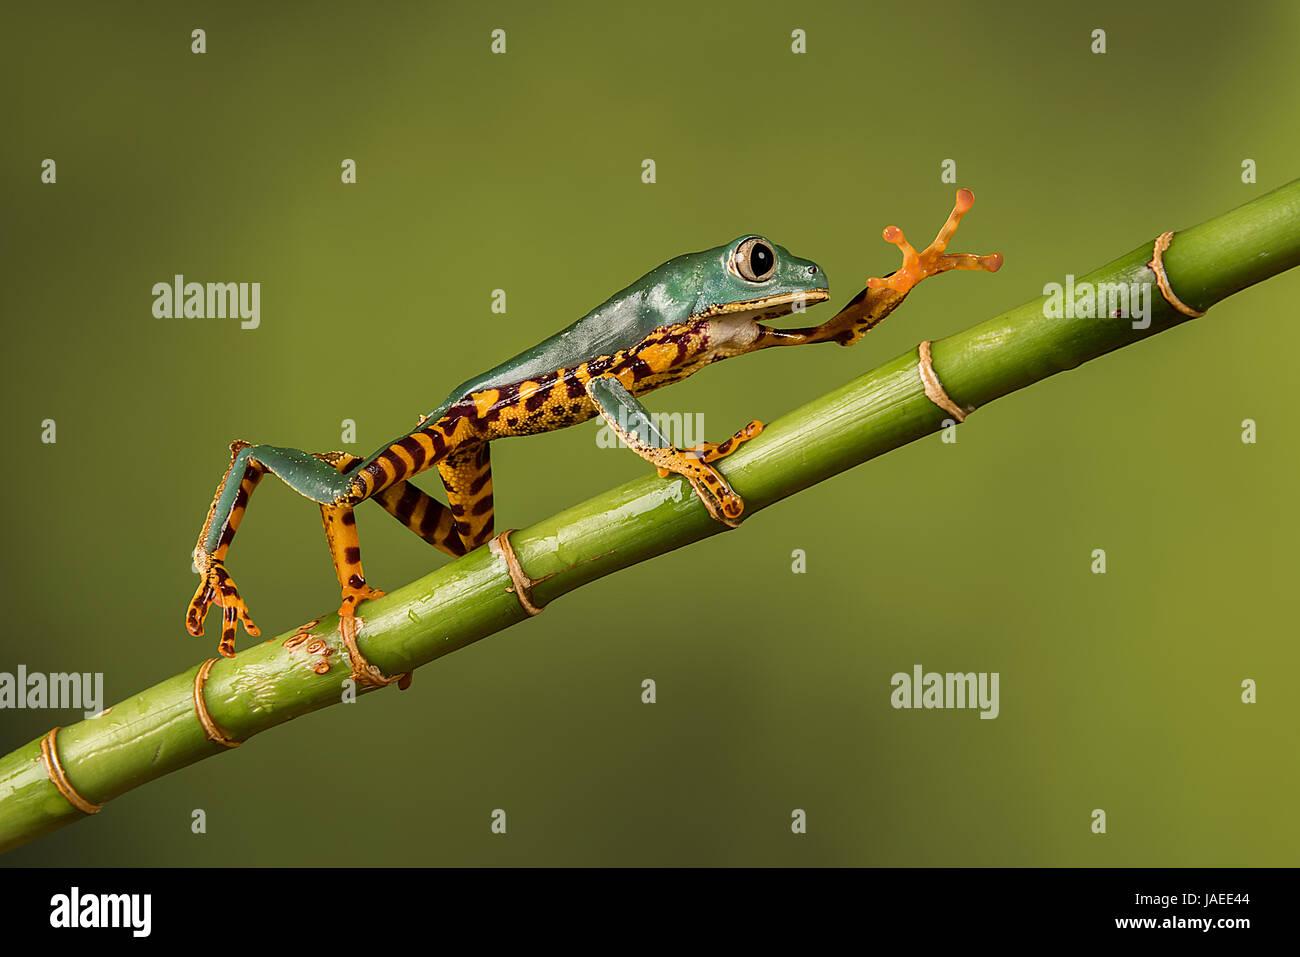 Pierna Tigre Super Monkey Tree Frog Imagen De Stock